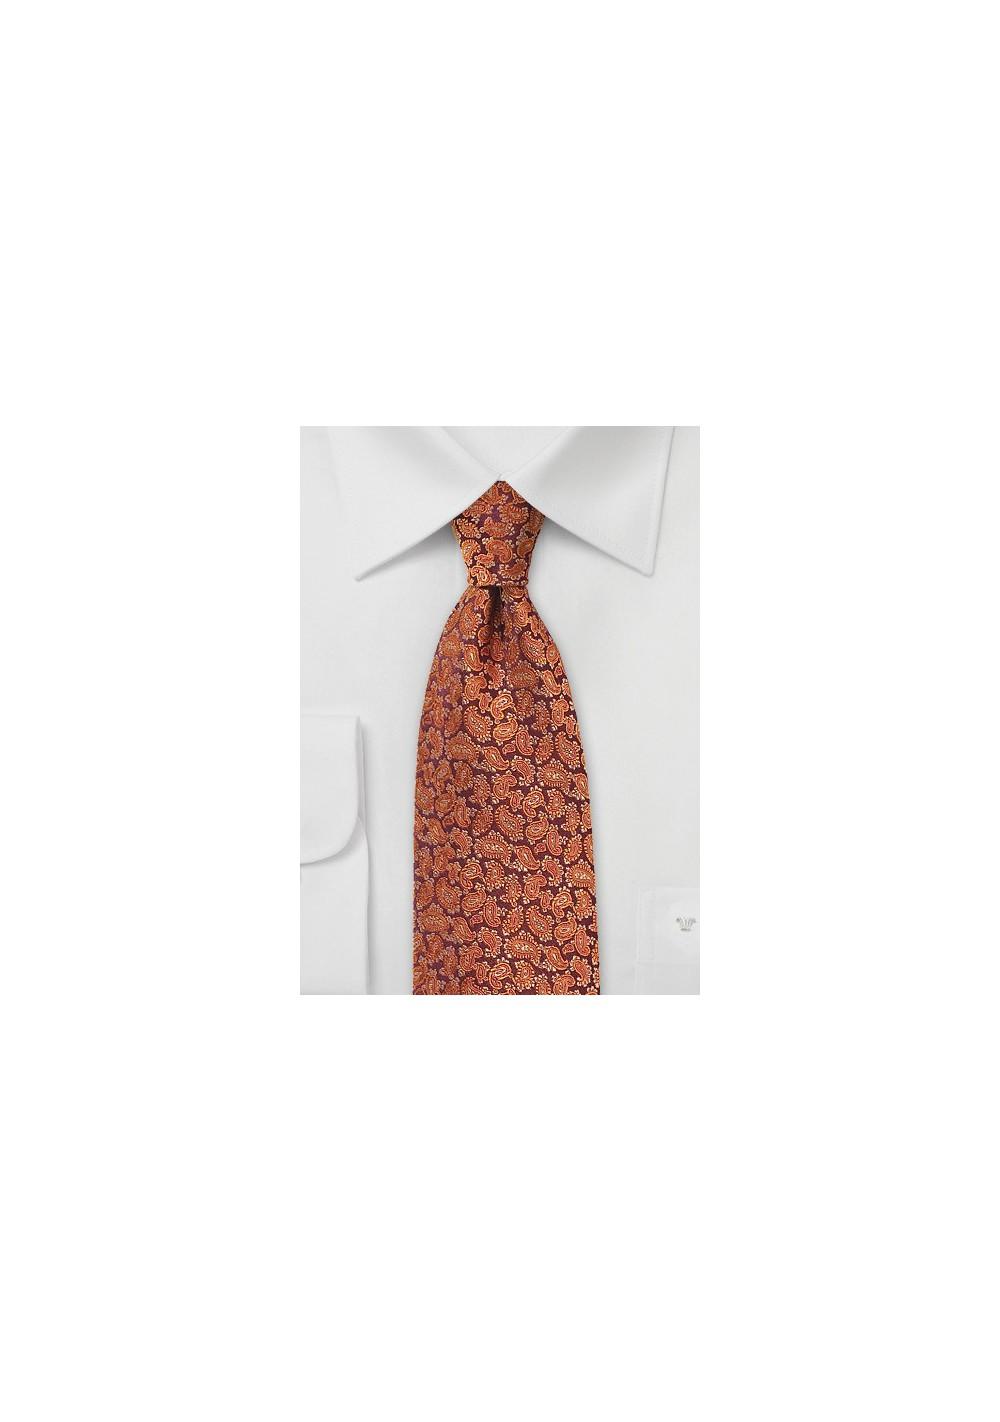 Woven Paisley Tie in Autumn Orange